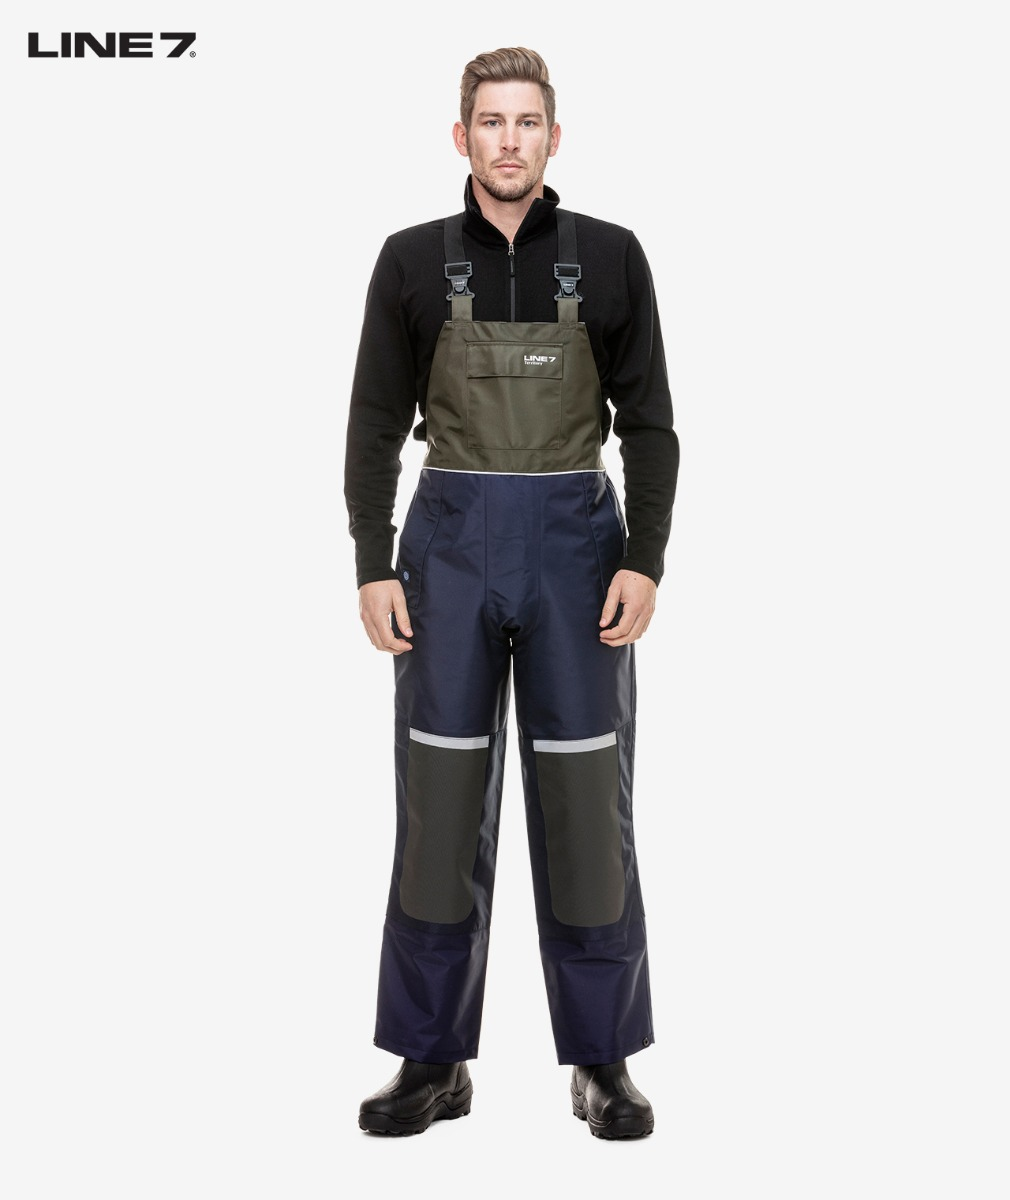 Line 7 Men's Territory Waterproof Bib Trouser